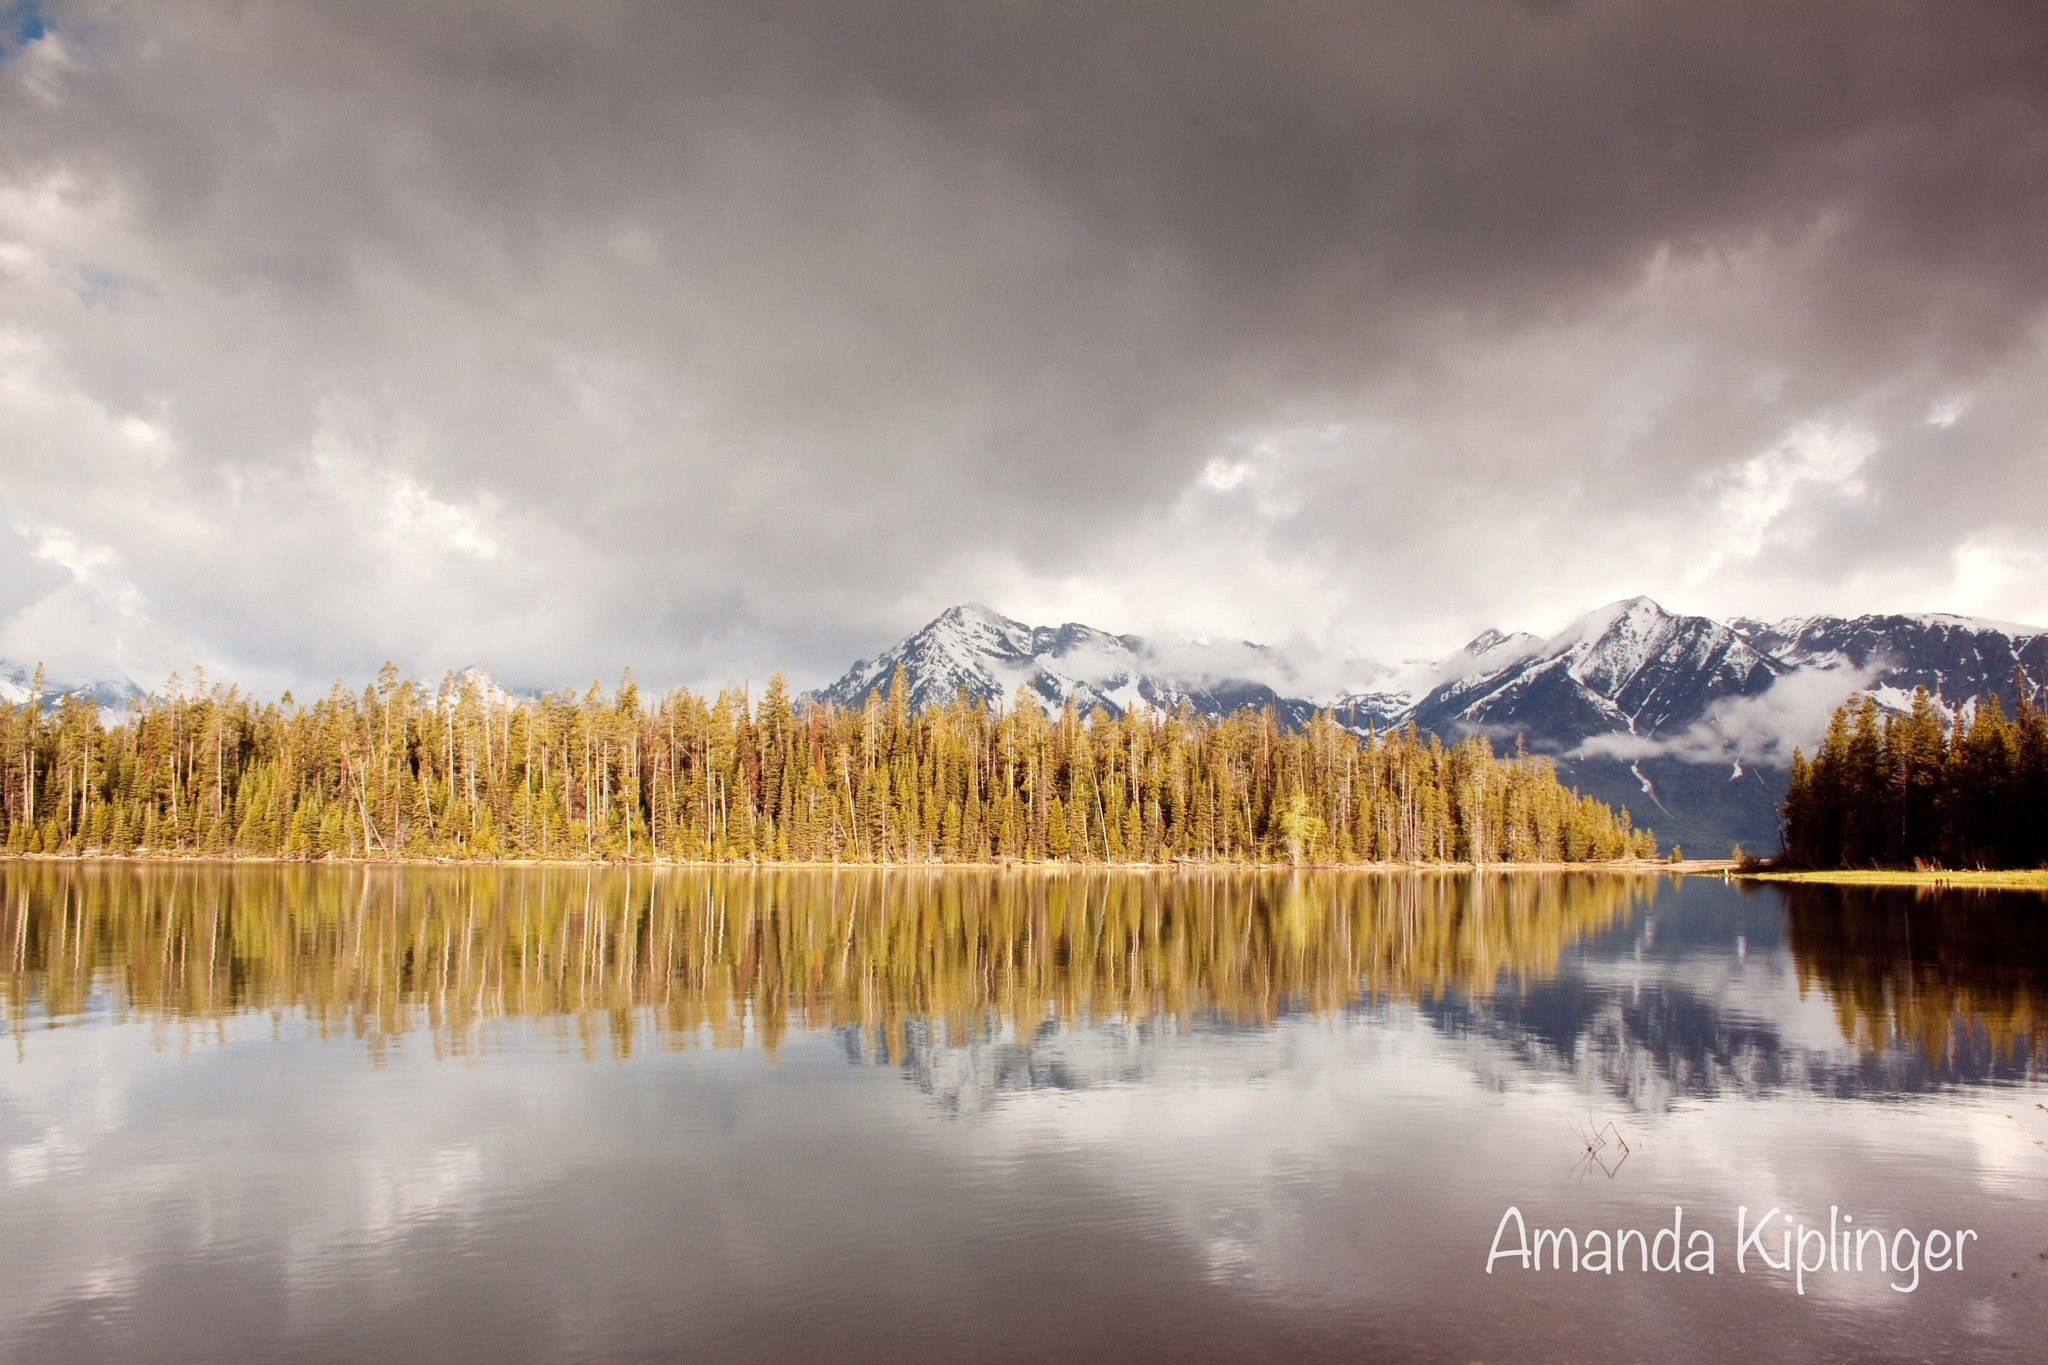 Clouds Moving In by Amanda Kiplinger